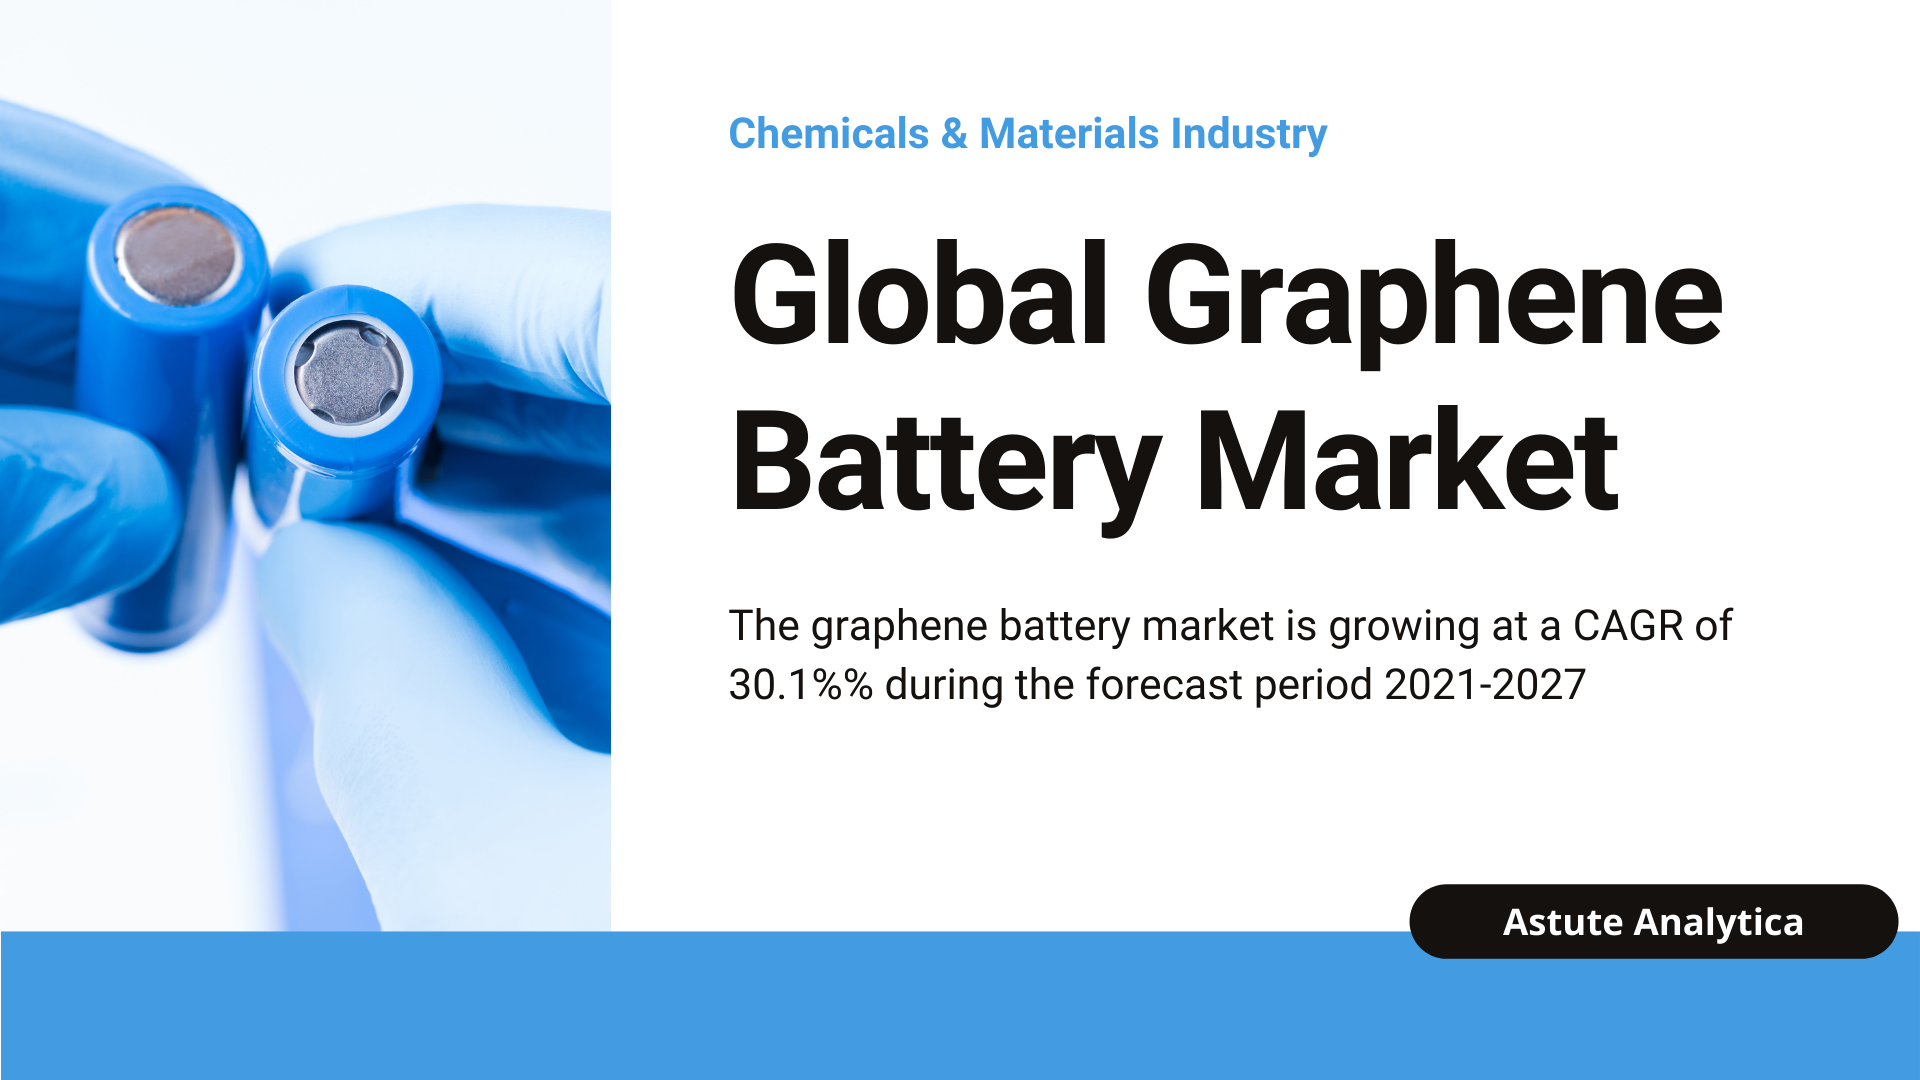 Graphene for battery market analysis to 2021-2027 | Cabot Corporation, Cambridge Nanosystems, Graphenano, Graphene NonoChem